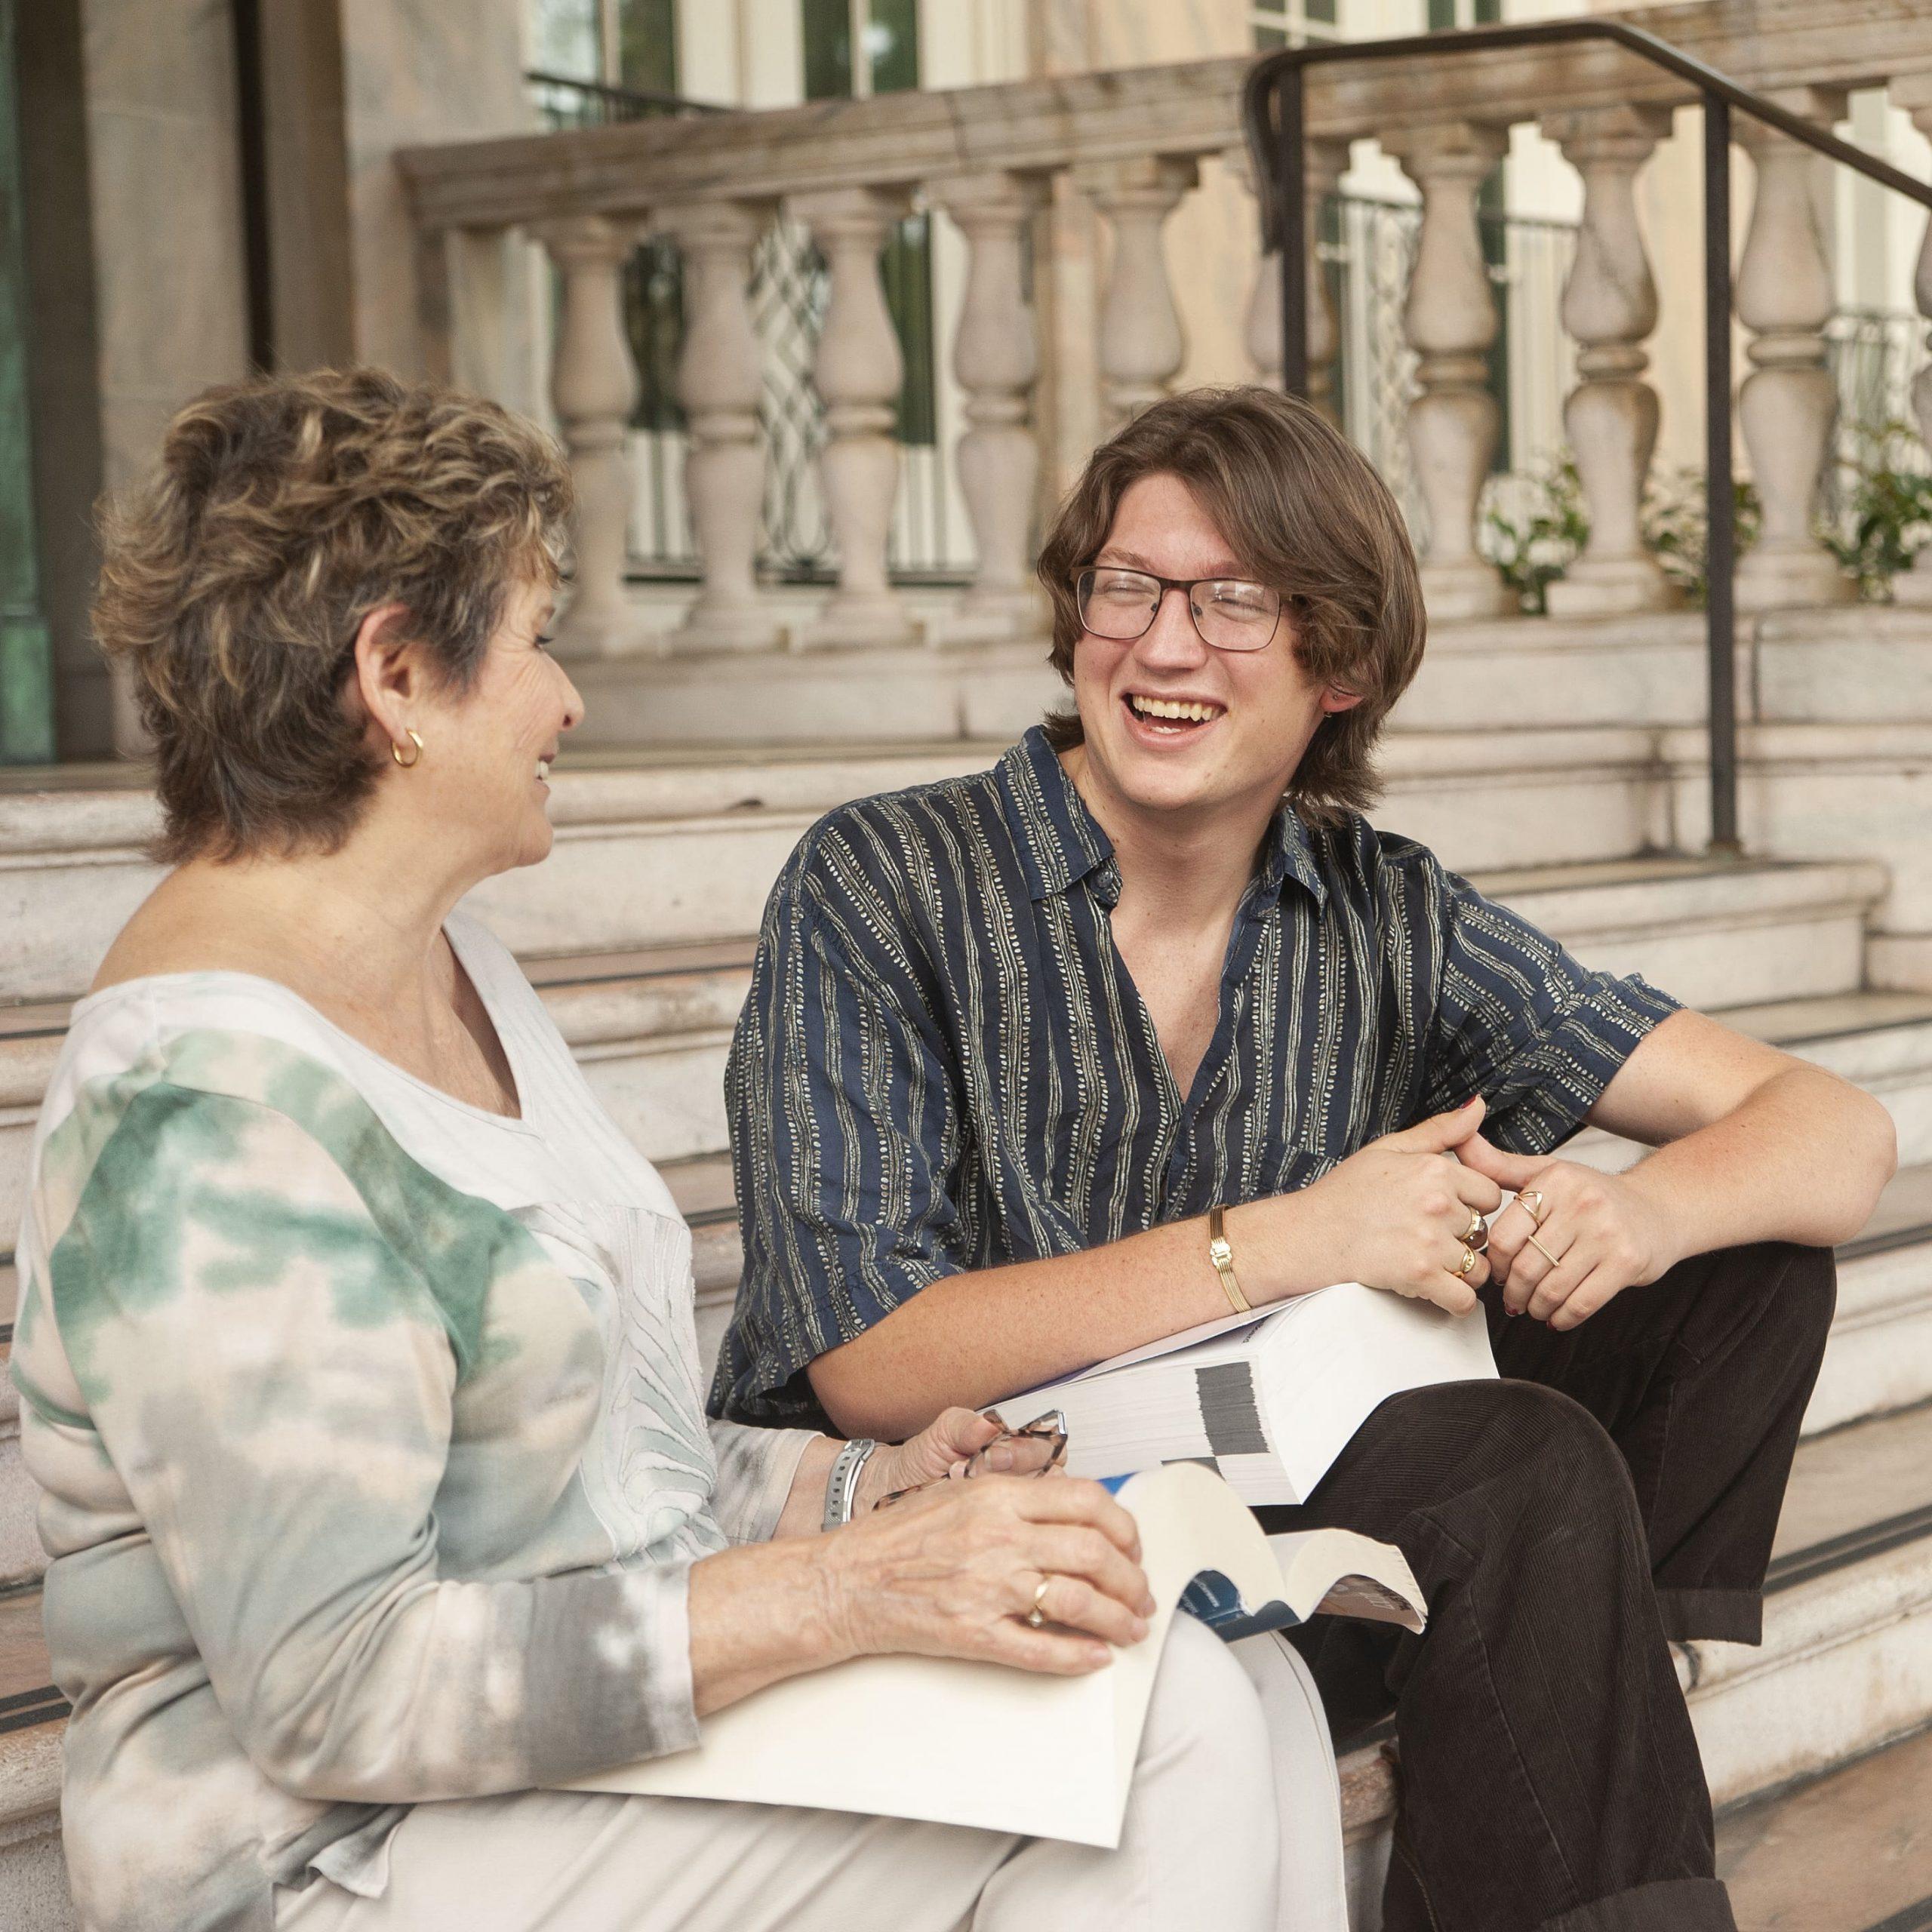 Ben and Helen | Student Mentoring Program